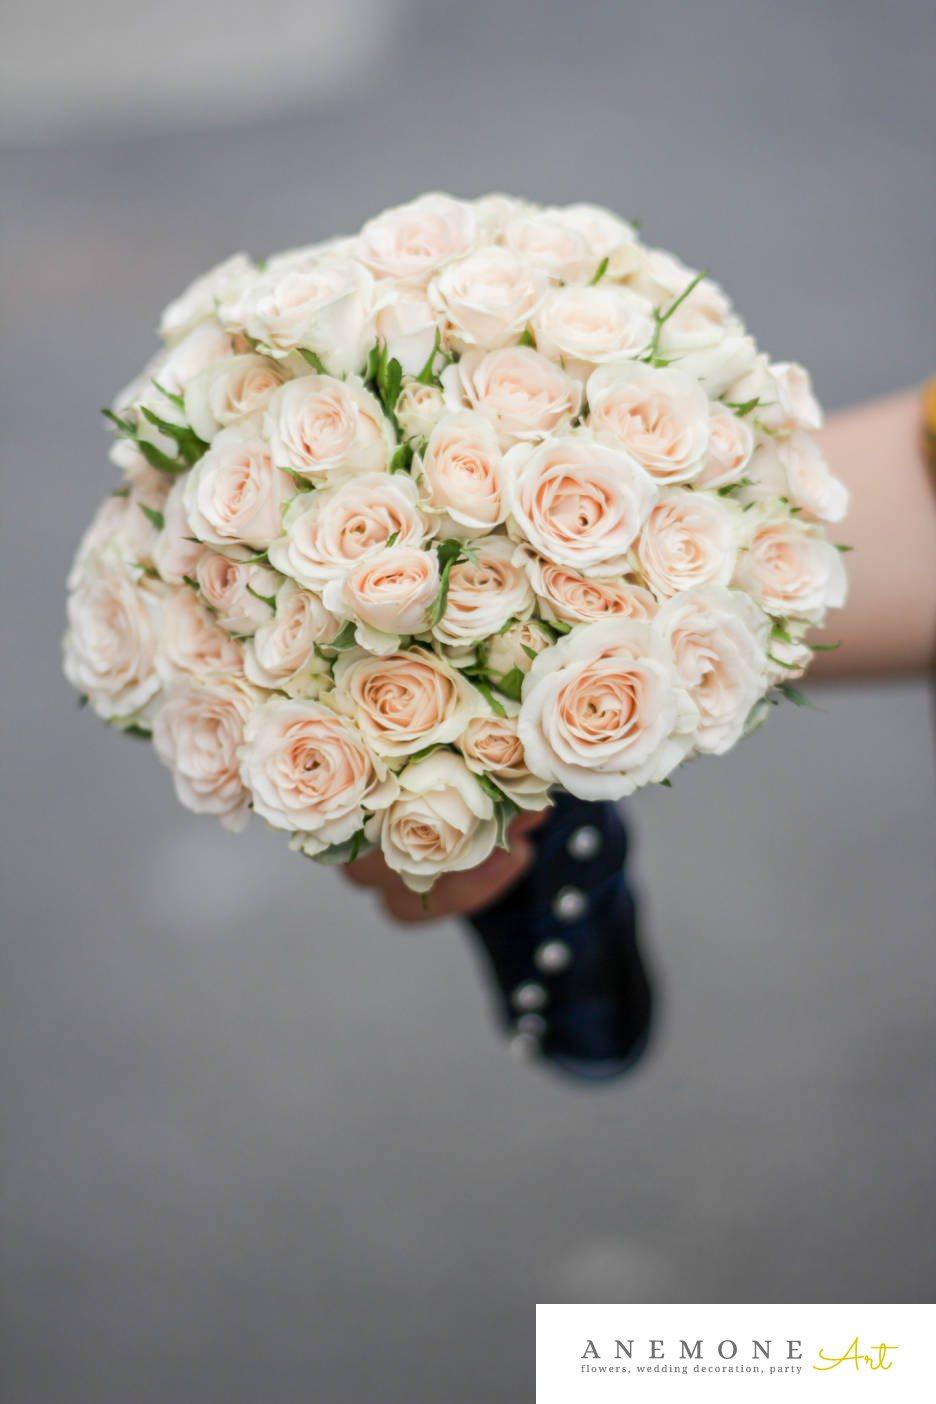 Poza, foto cu Flori de nunta buchet mireasa, mini-rosa, piersica, rotund in Arad, Timisoara, Oradea (wedding flowers, bouquets) nunta Arad, Timisoara, Oradea